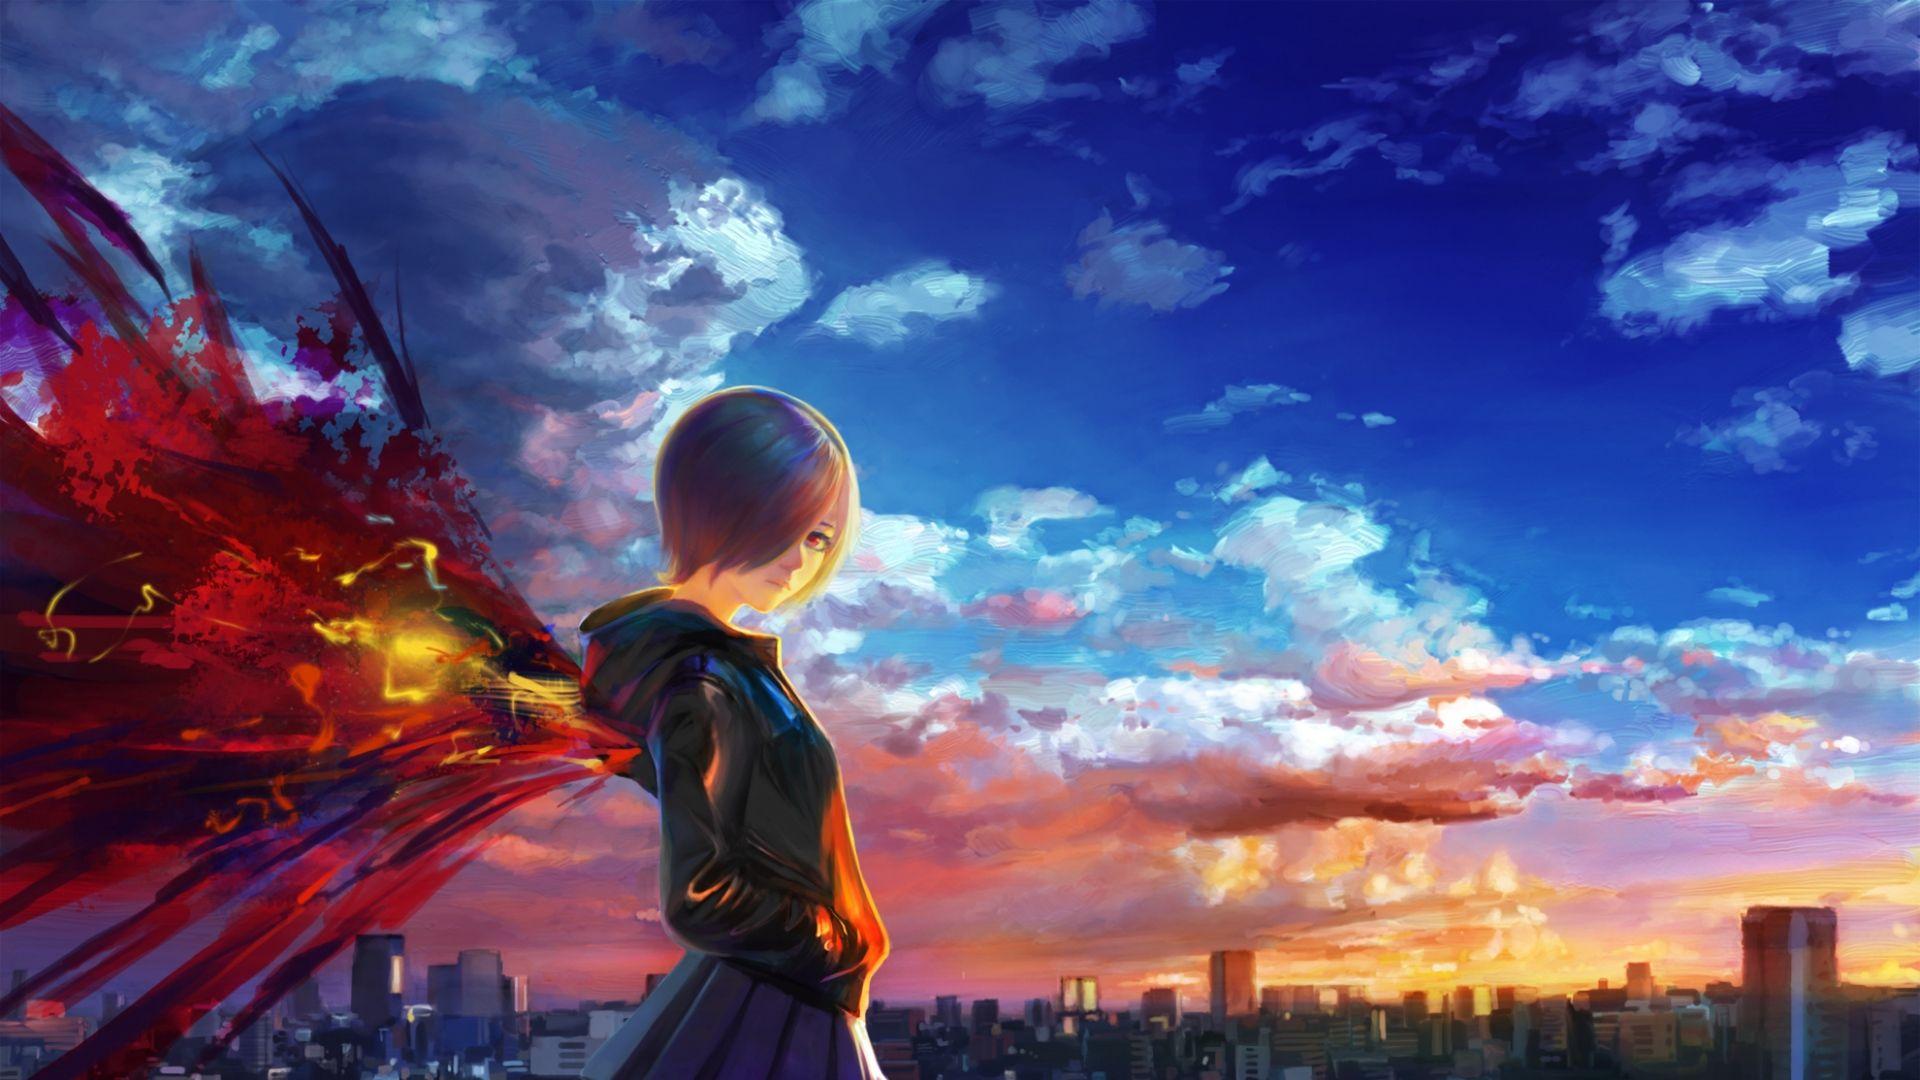 Cool Anime Wallpapers HD 1920x1080 10